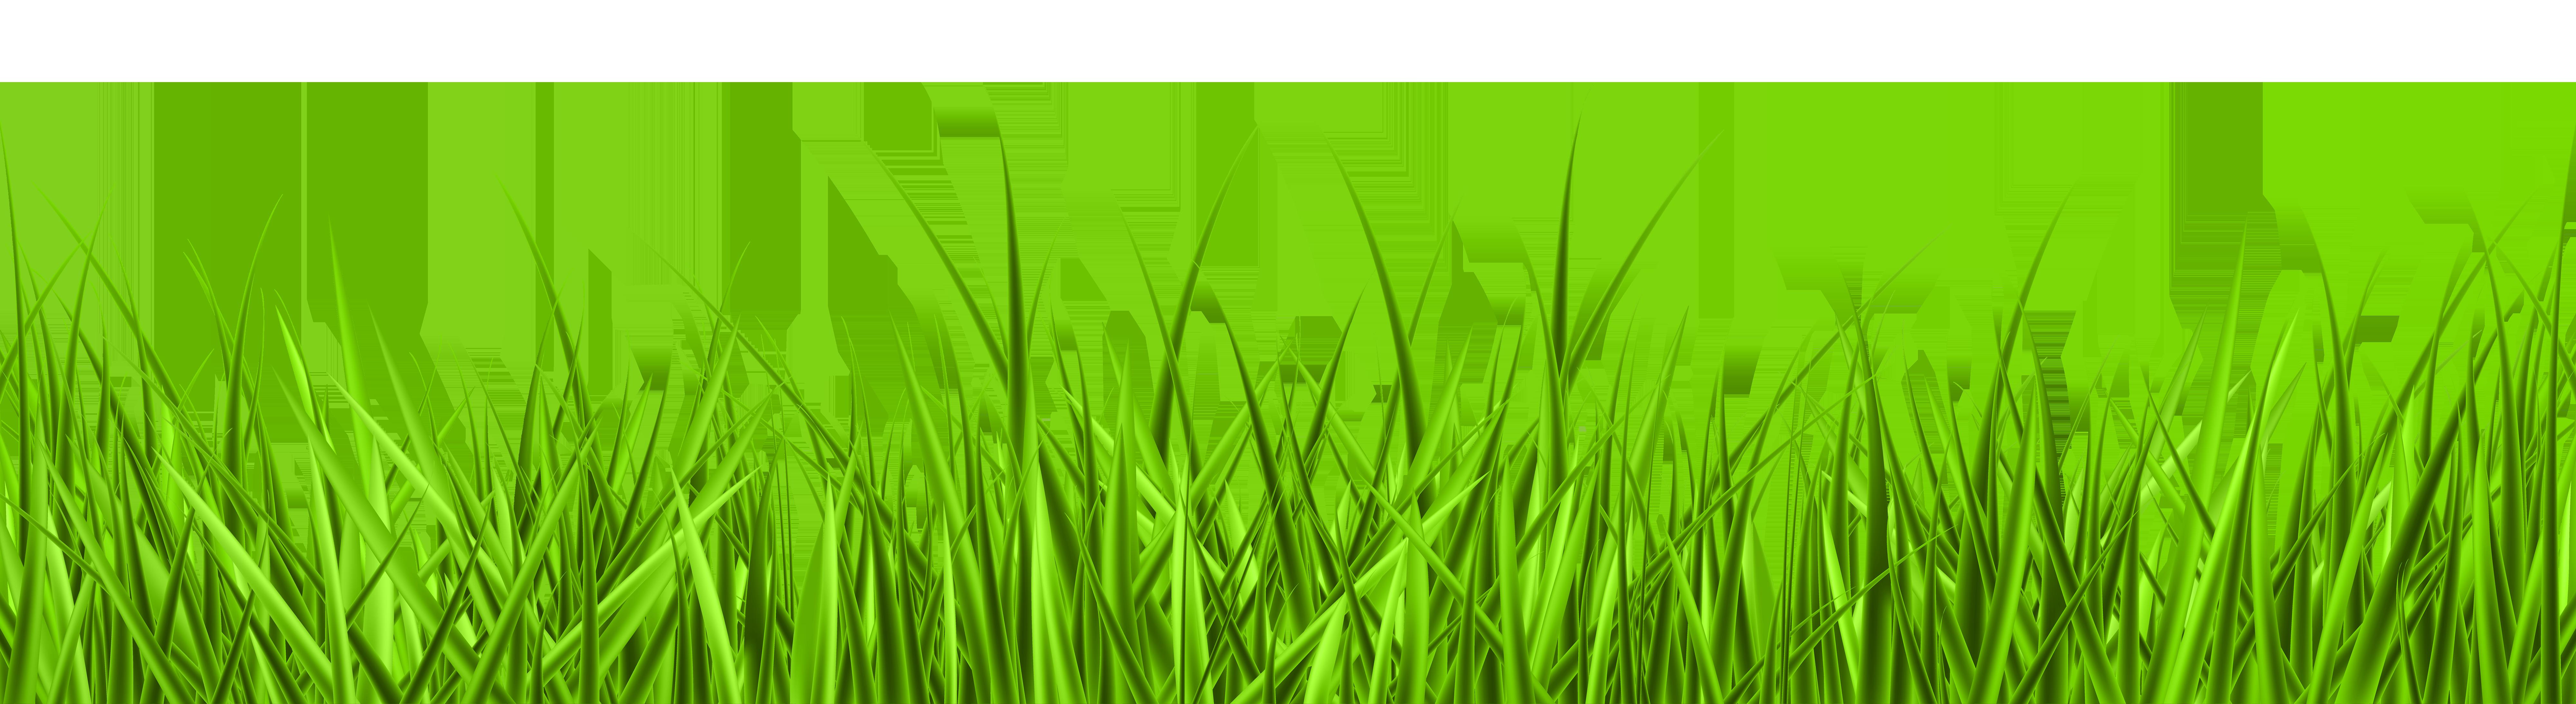 Grass PNG Clip Art Image.